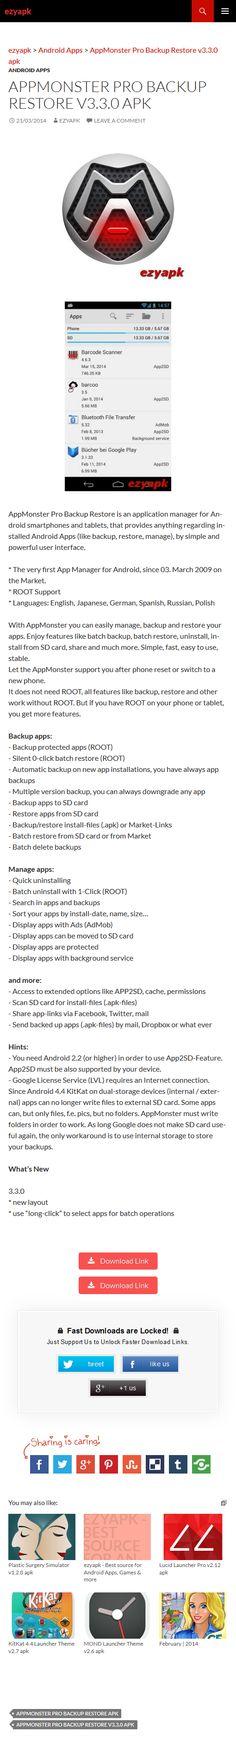 poweramp full version unlocker apk 529